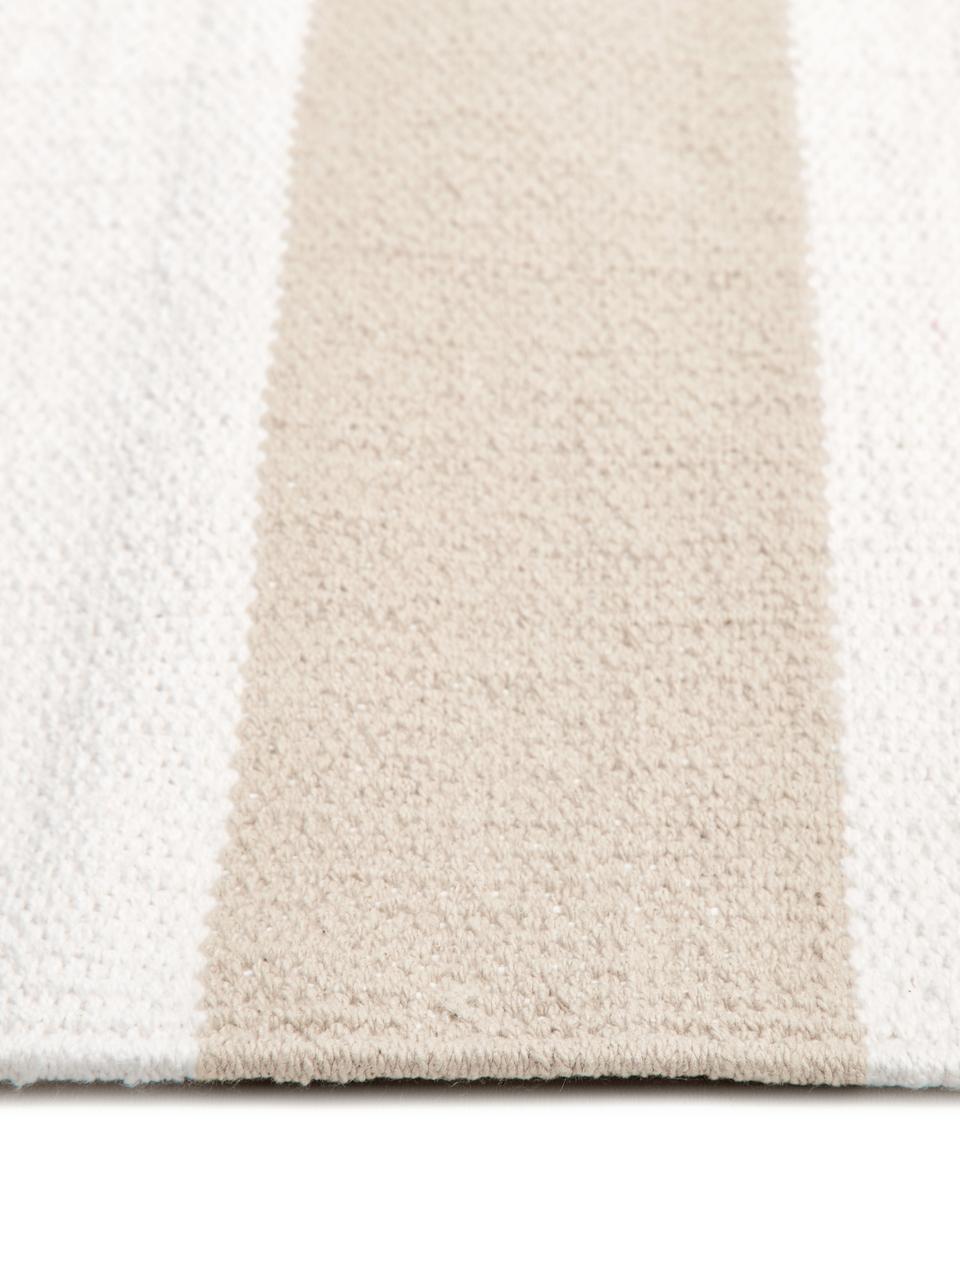 Tapis rayé beige blanc tissé main Blocker, Blanc crème/taupe